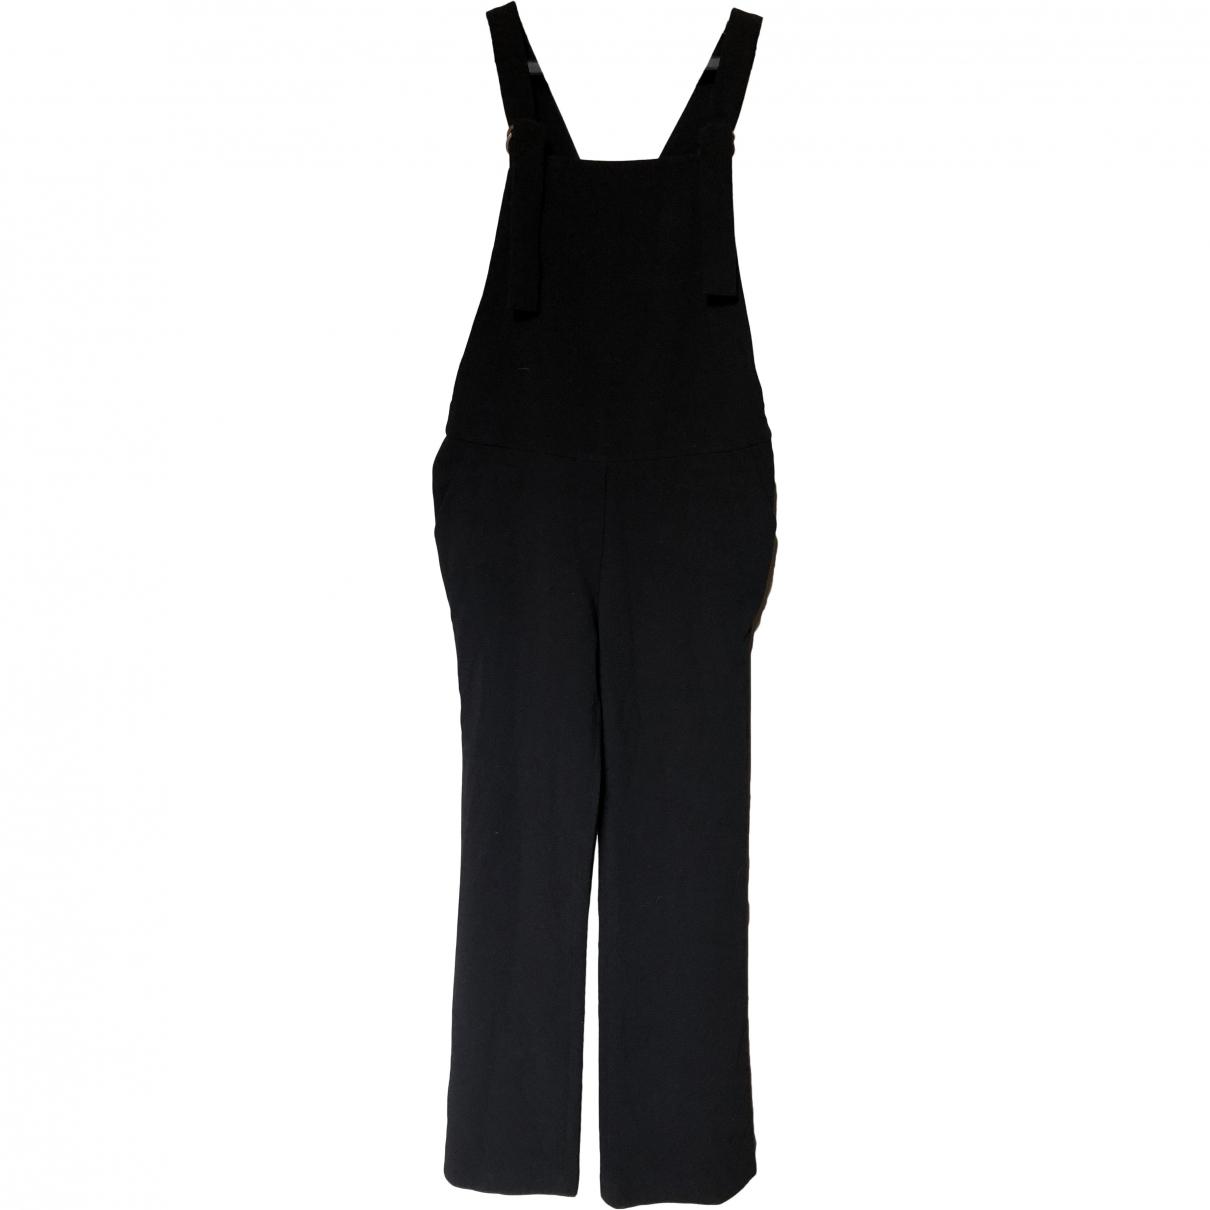 Bel Air \N Black jumpsuit for Women 2 0-5